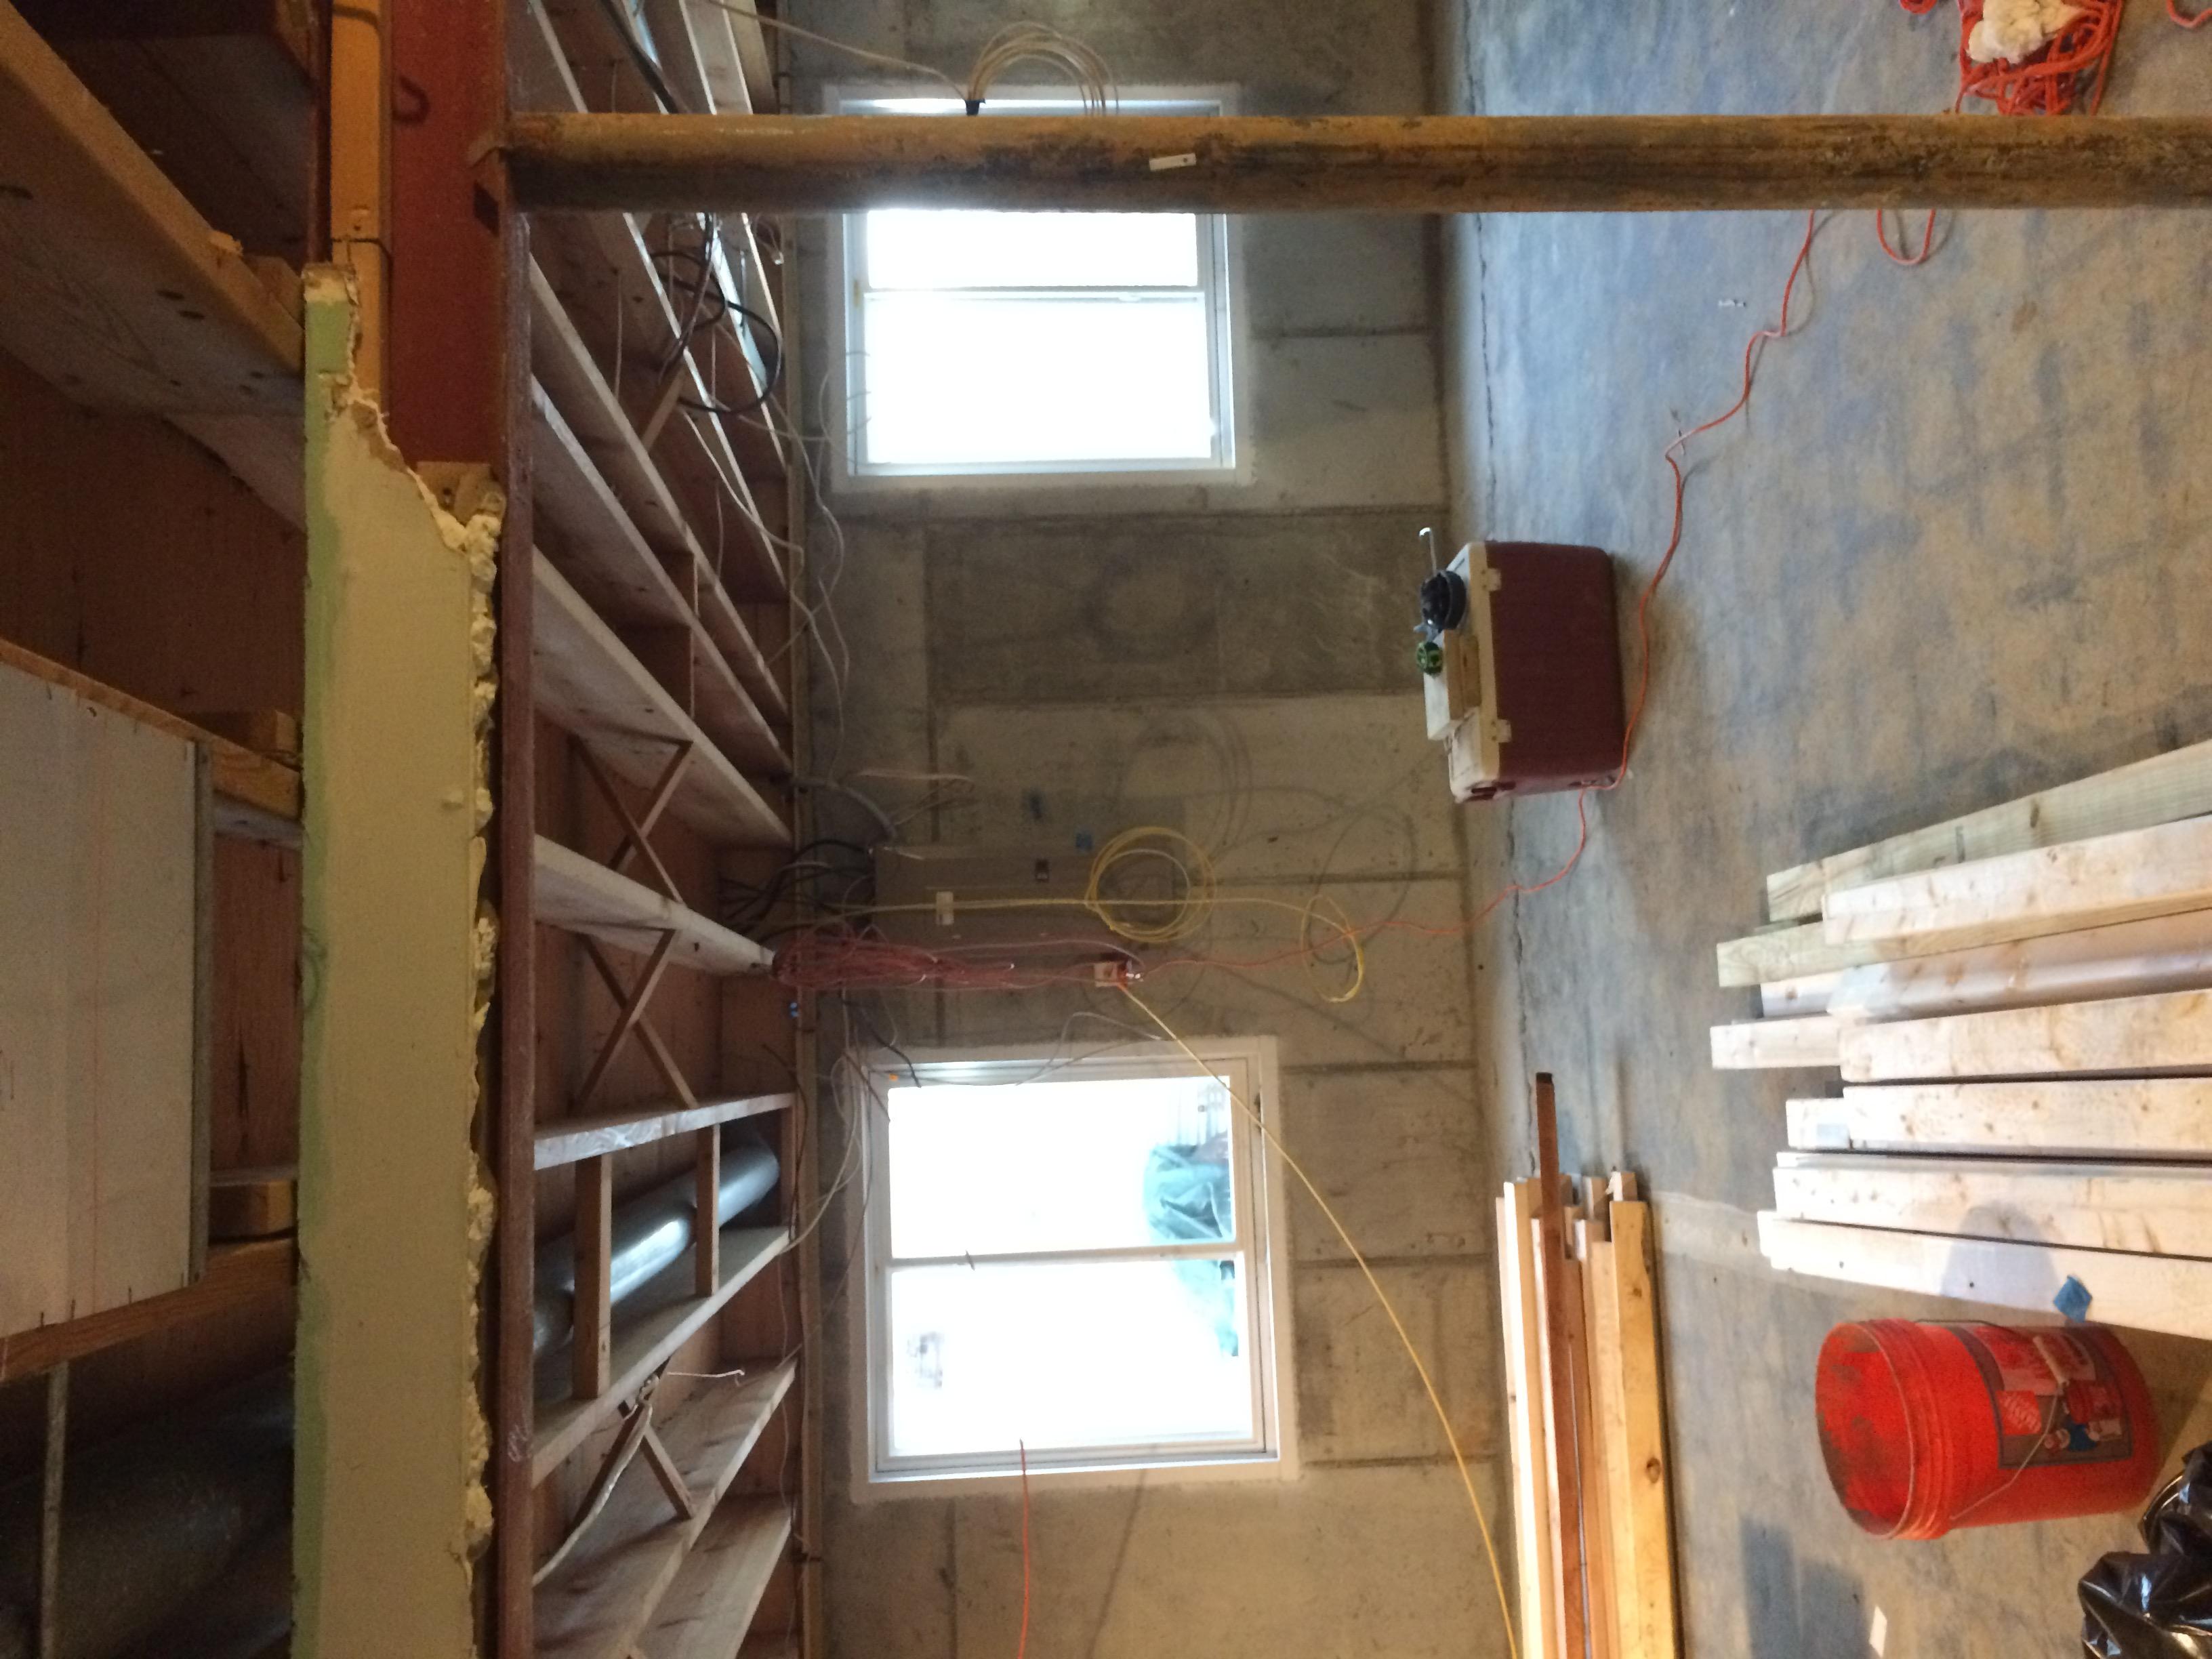 Lighting Basement Washroom Stairs: Moving Basement Stairs